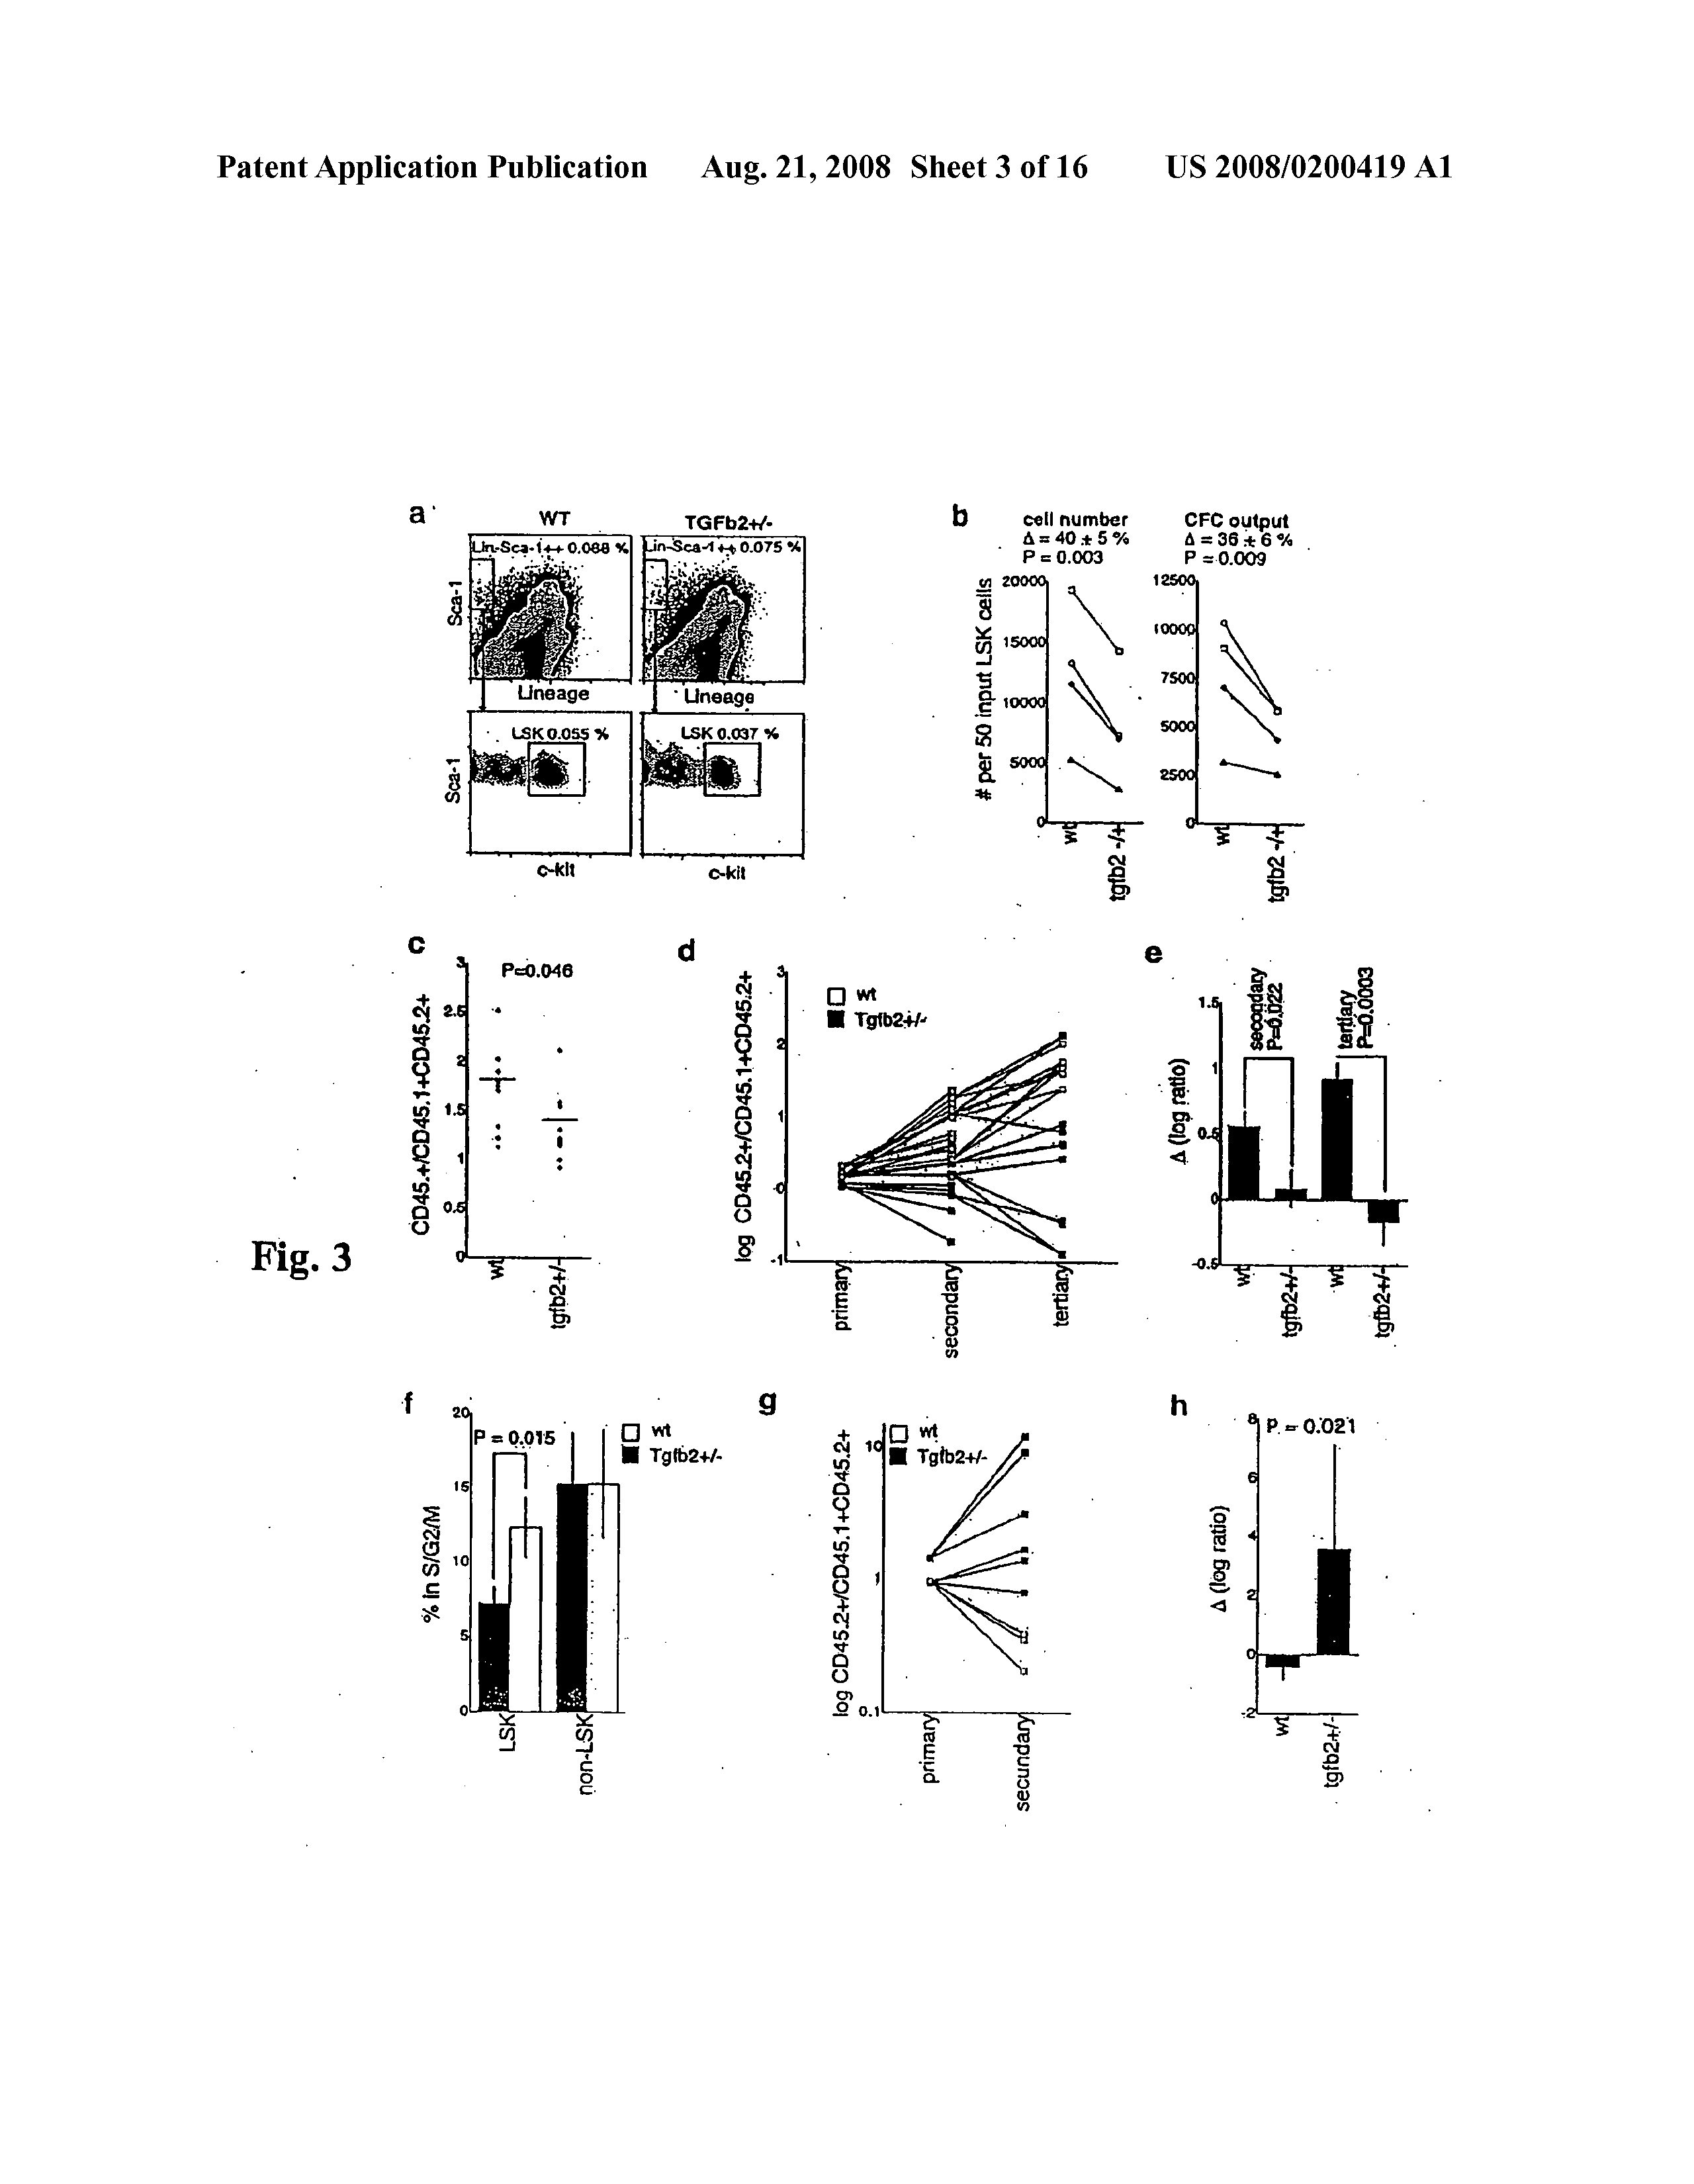 Rgi 150 Wiring Diagram Vector. . Wiring Diagram Ge Refrigerator Wiring Diagram Gshf Hgd on